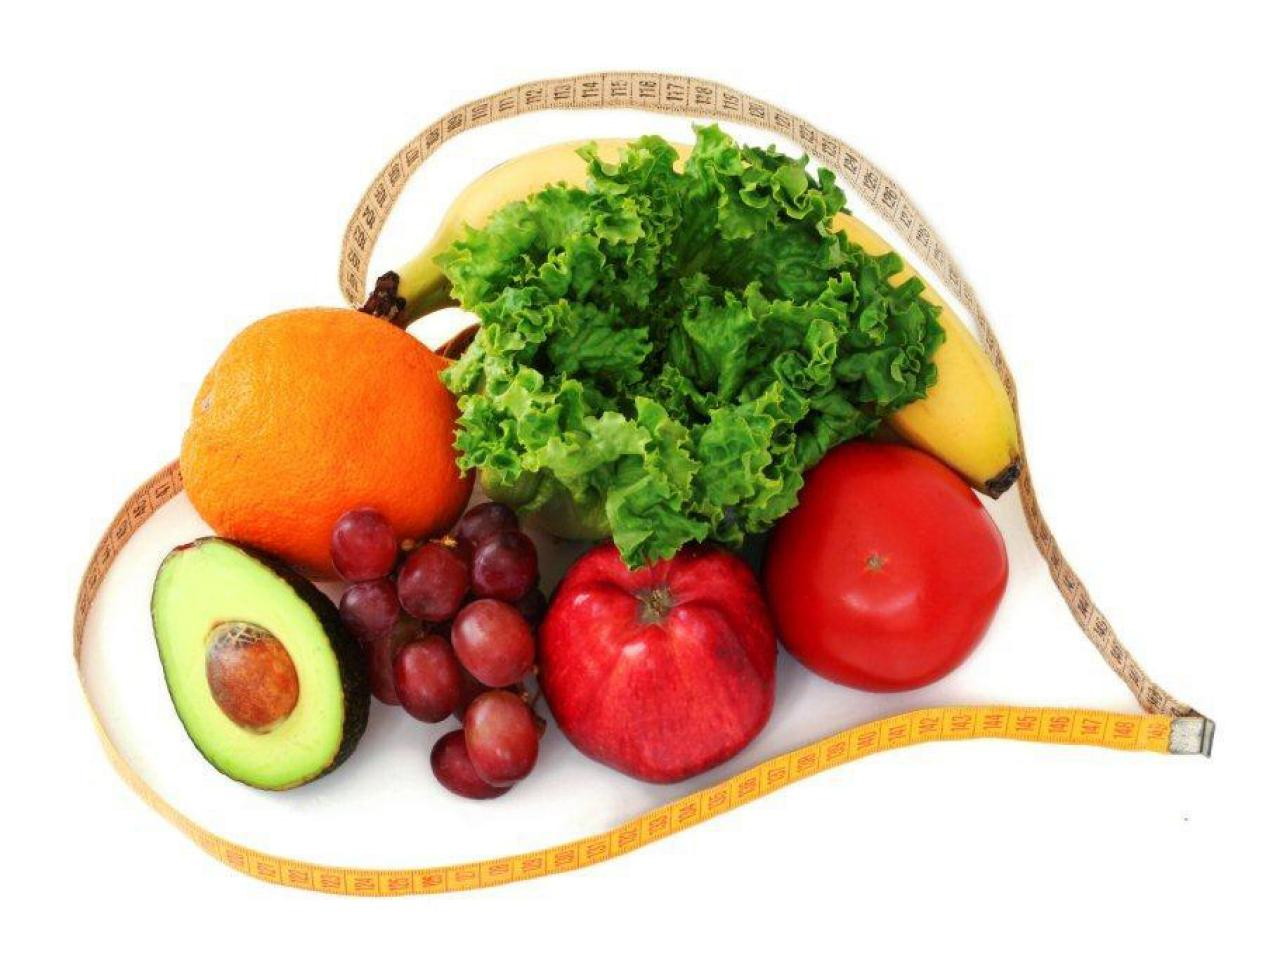 DASH diet for weight loss | LuckyFit